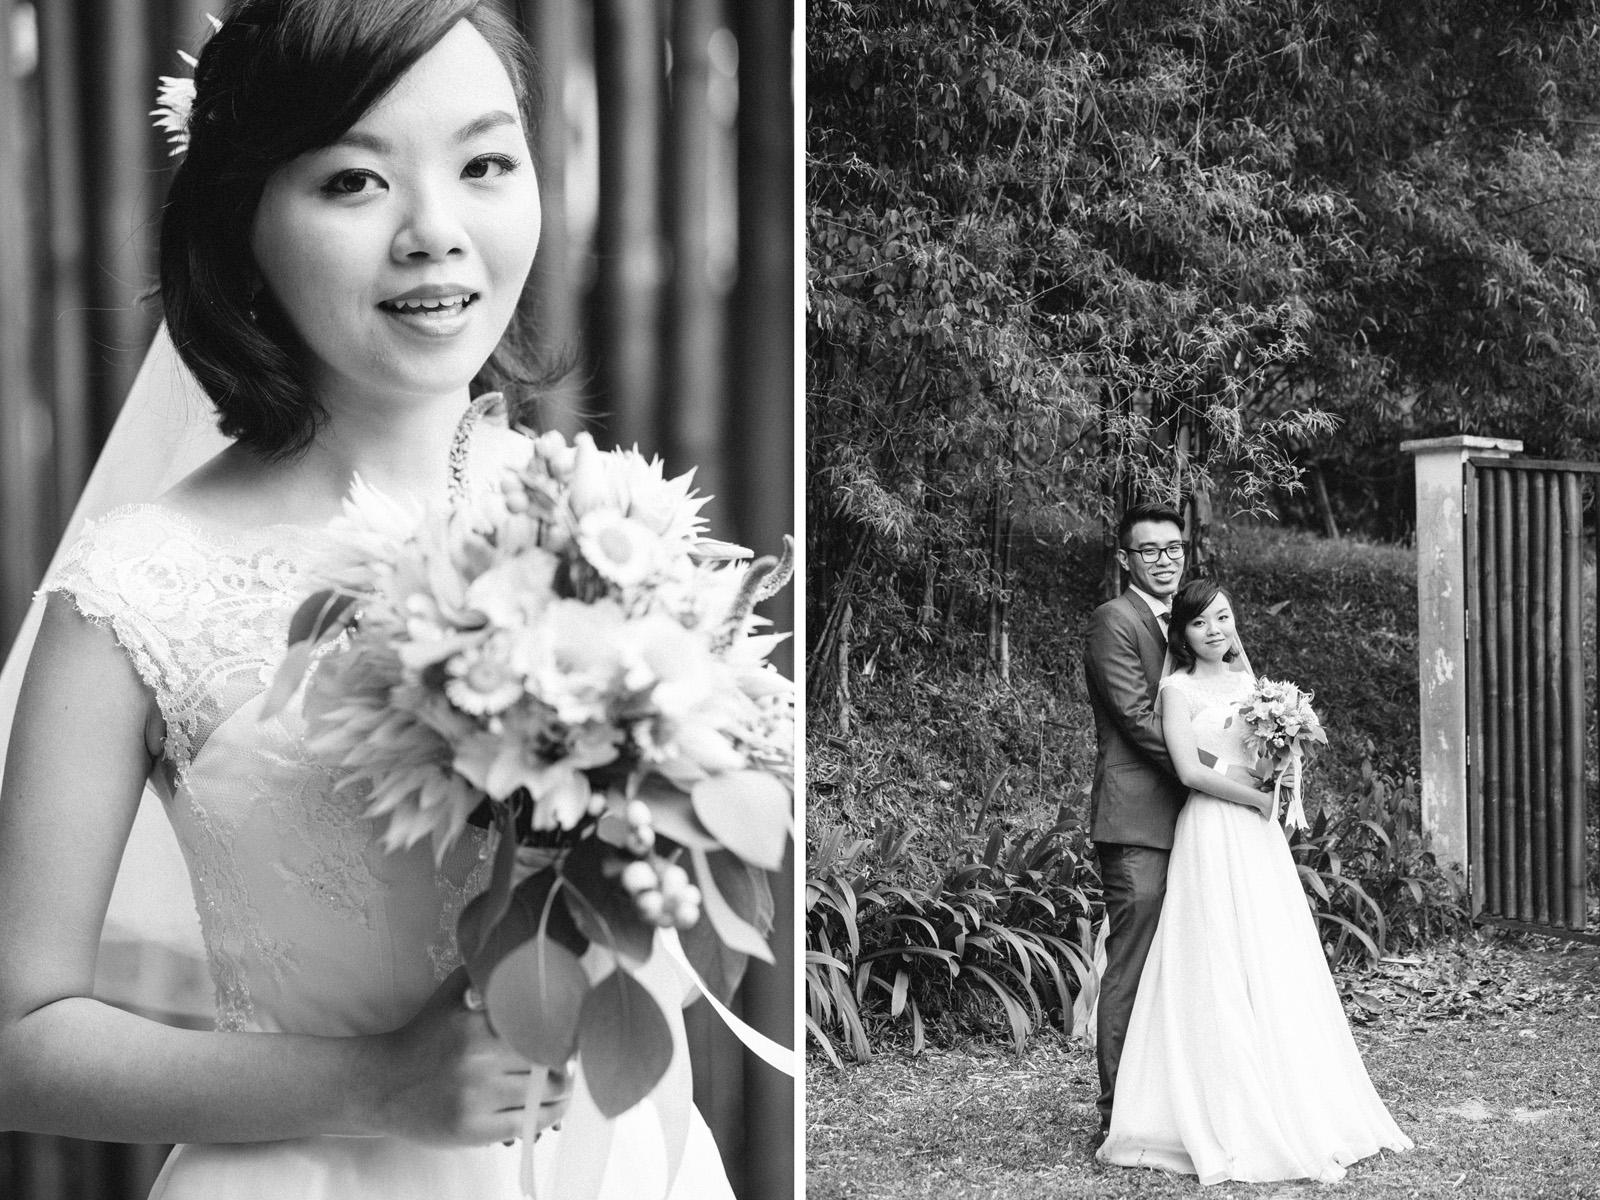 singapore-wedding-travel-photographer-faith-alvin-wedding-wmt-35.jpg